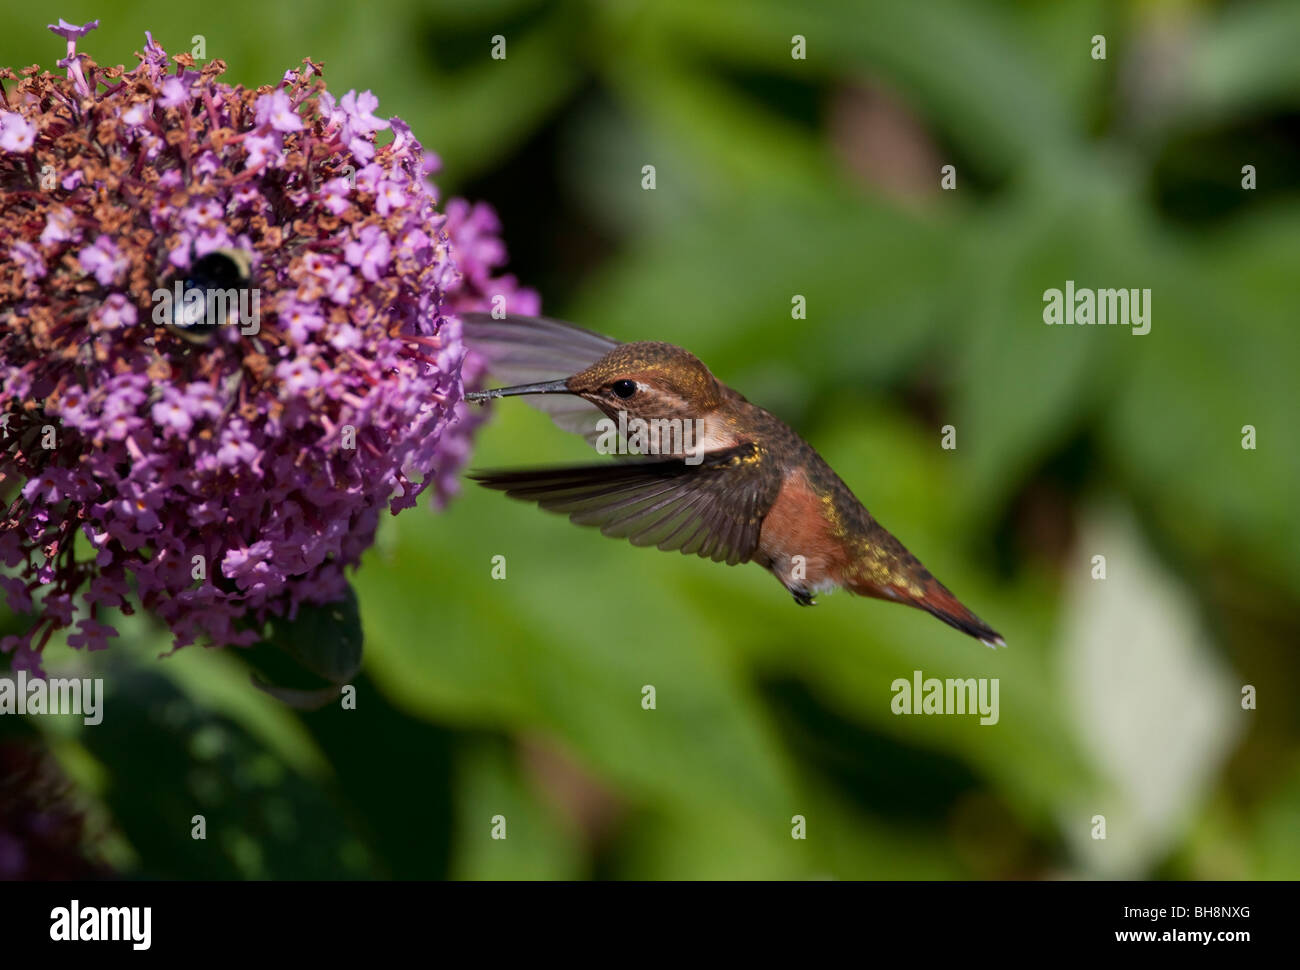 Rufous Hummingbird Selasphorus rufus female feeding on nectar from a Buddleia flower in Nanaimo Vancouver Island - Stock Image